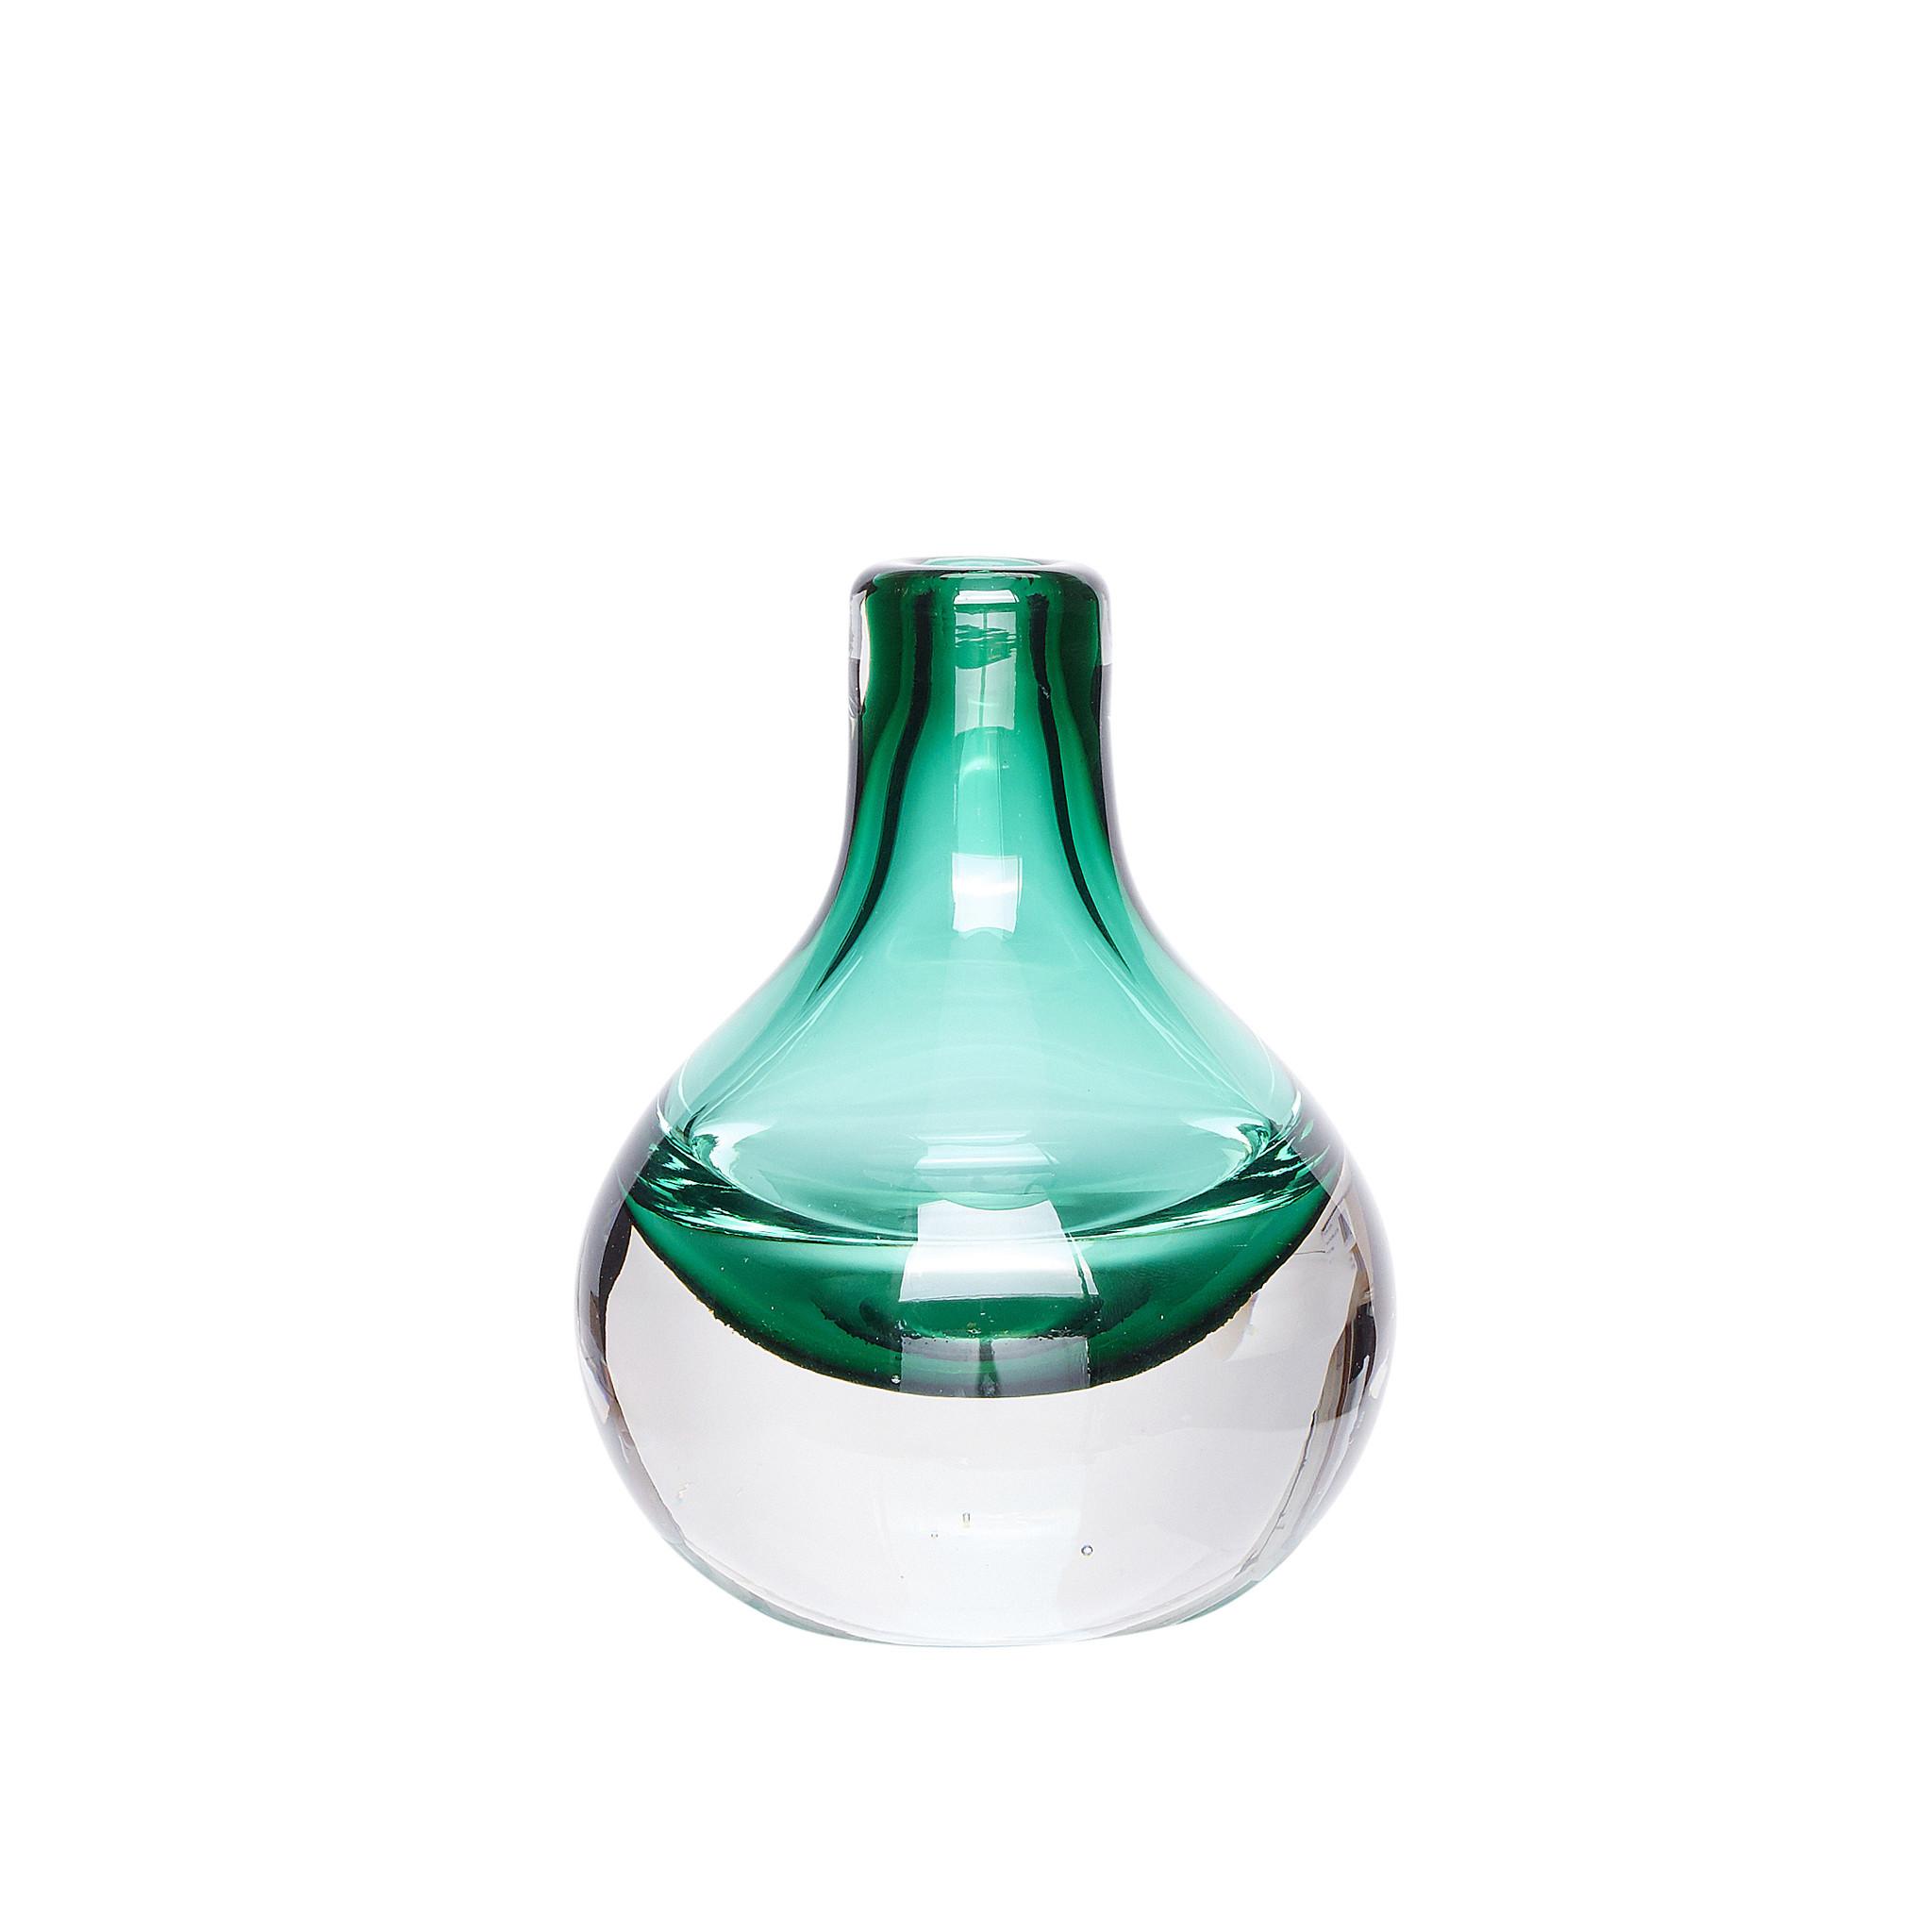 Hubsch Vaas, glas, helder / groen-950301-5712772055106